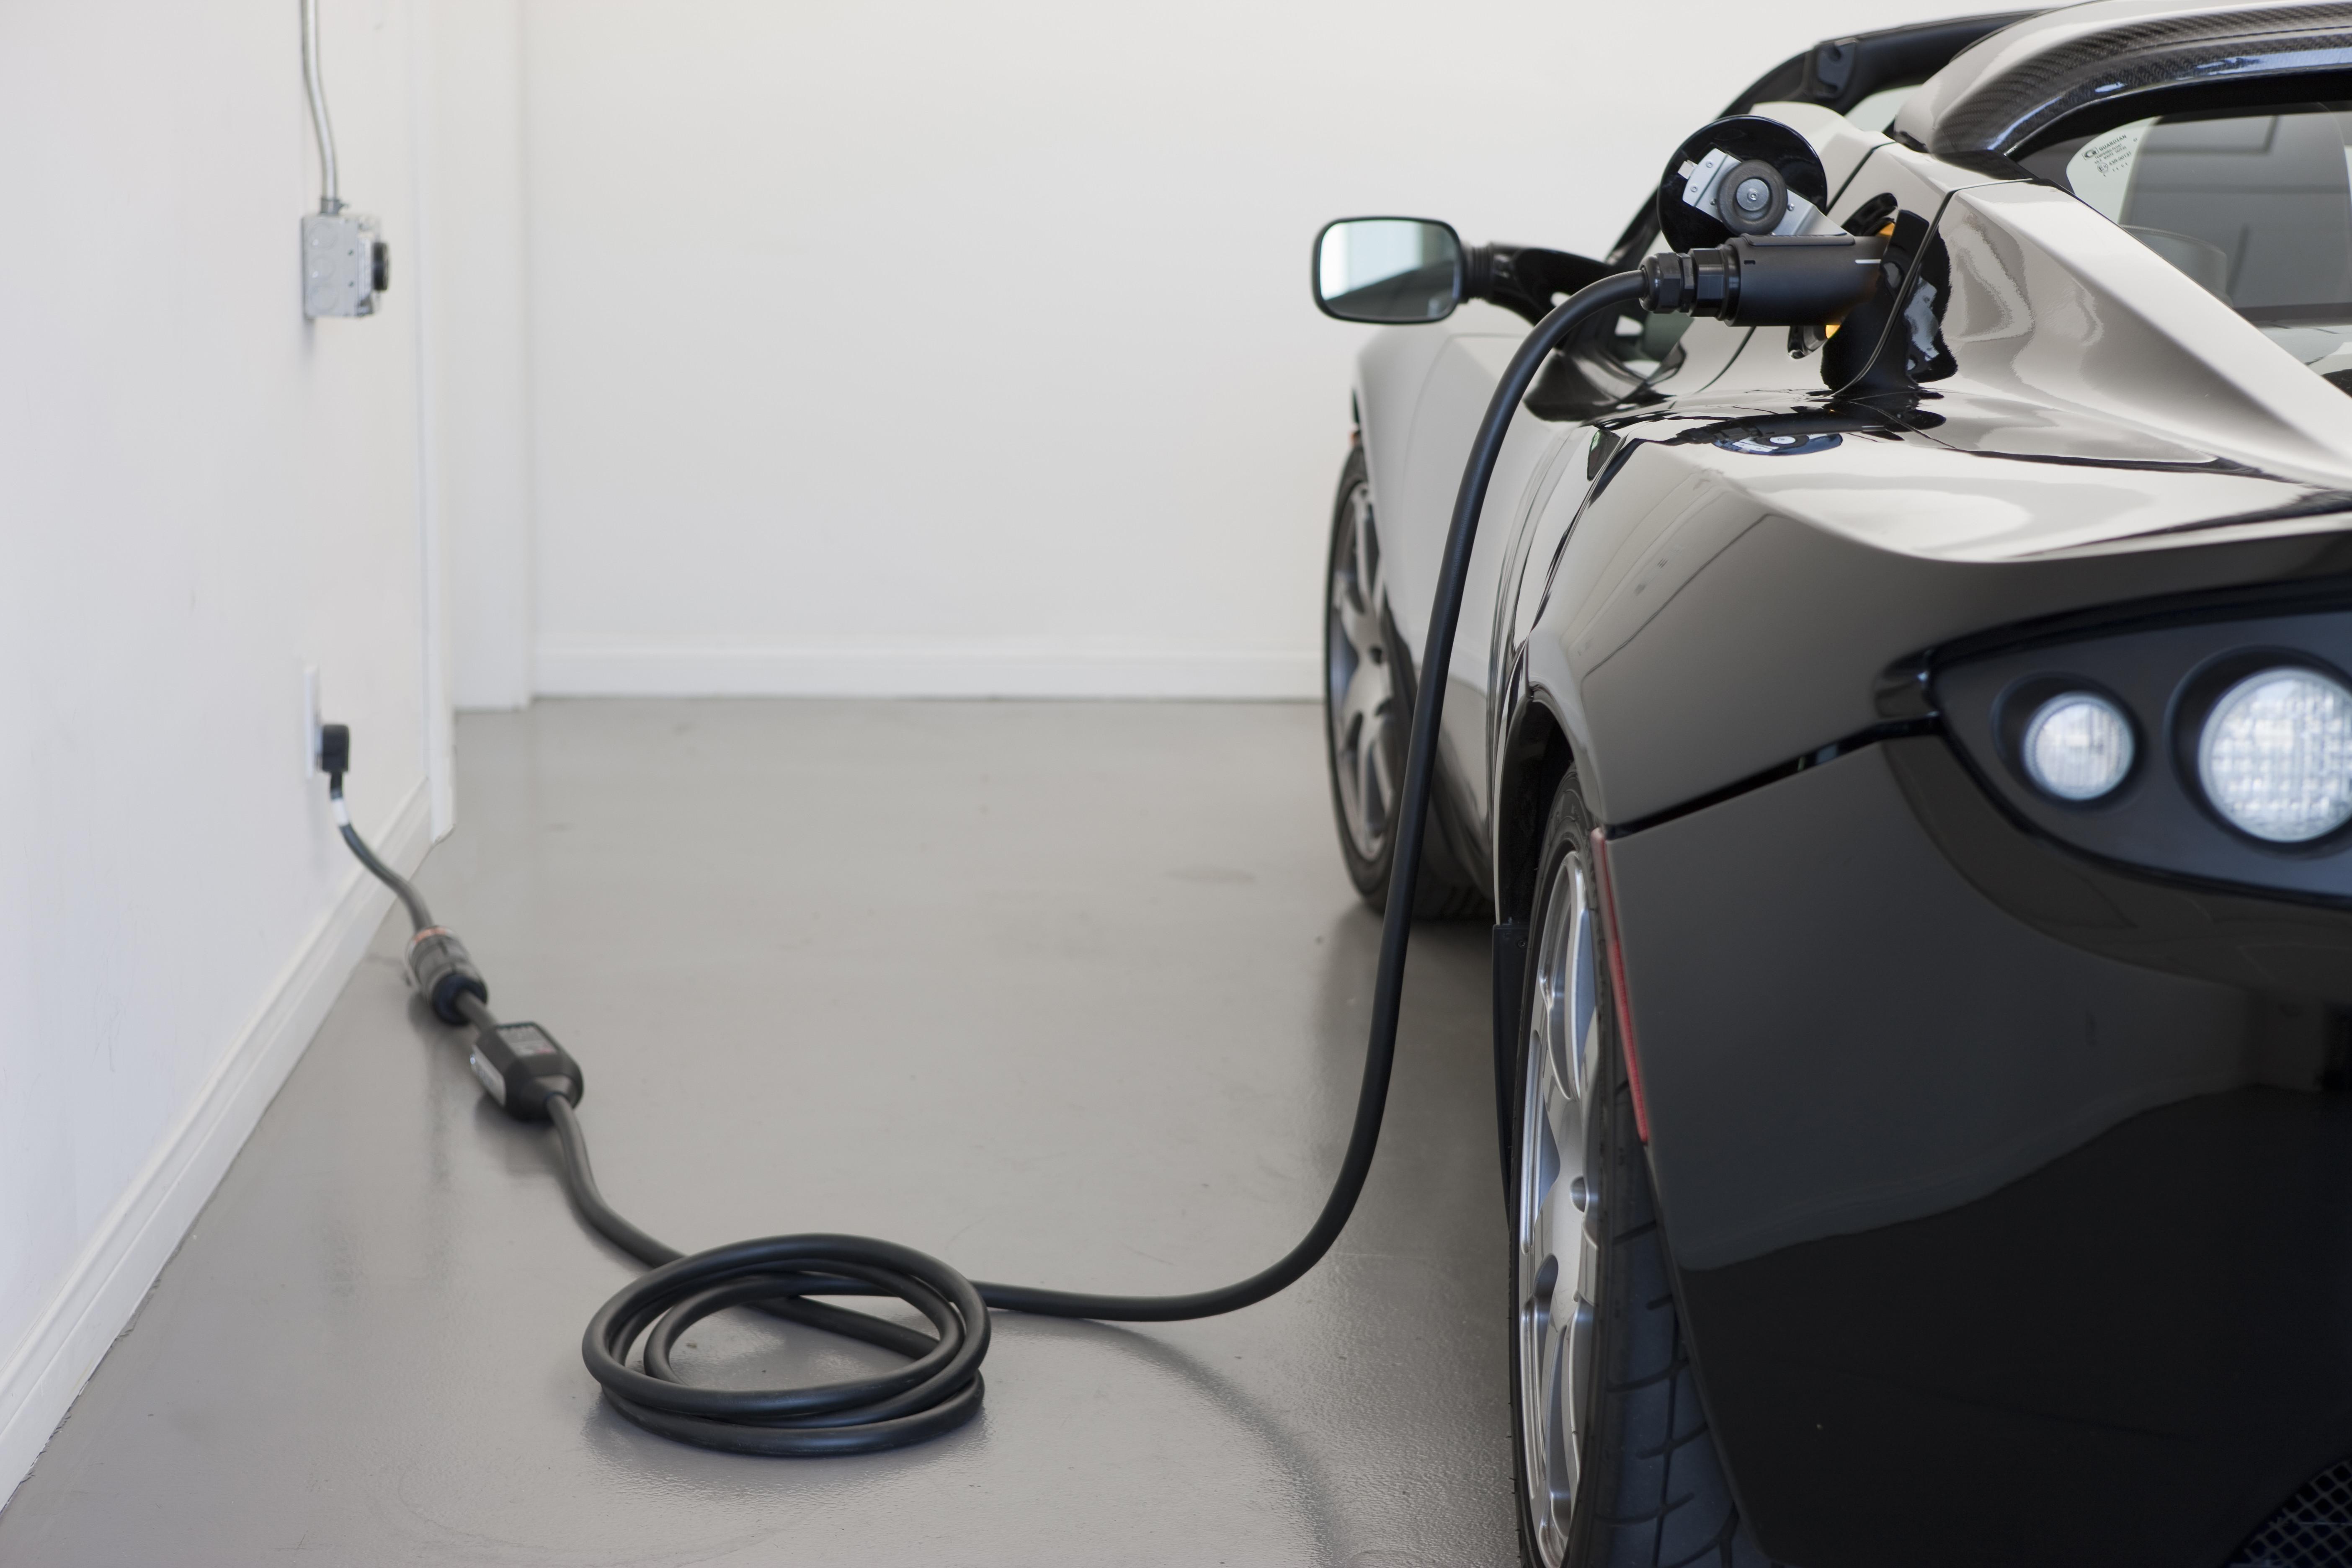 Tesla Roadster electric car